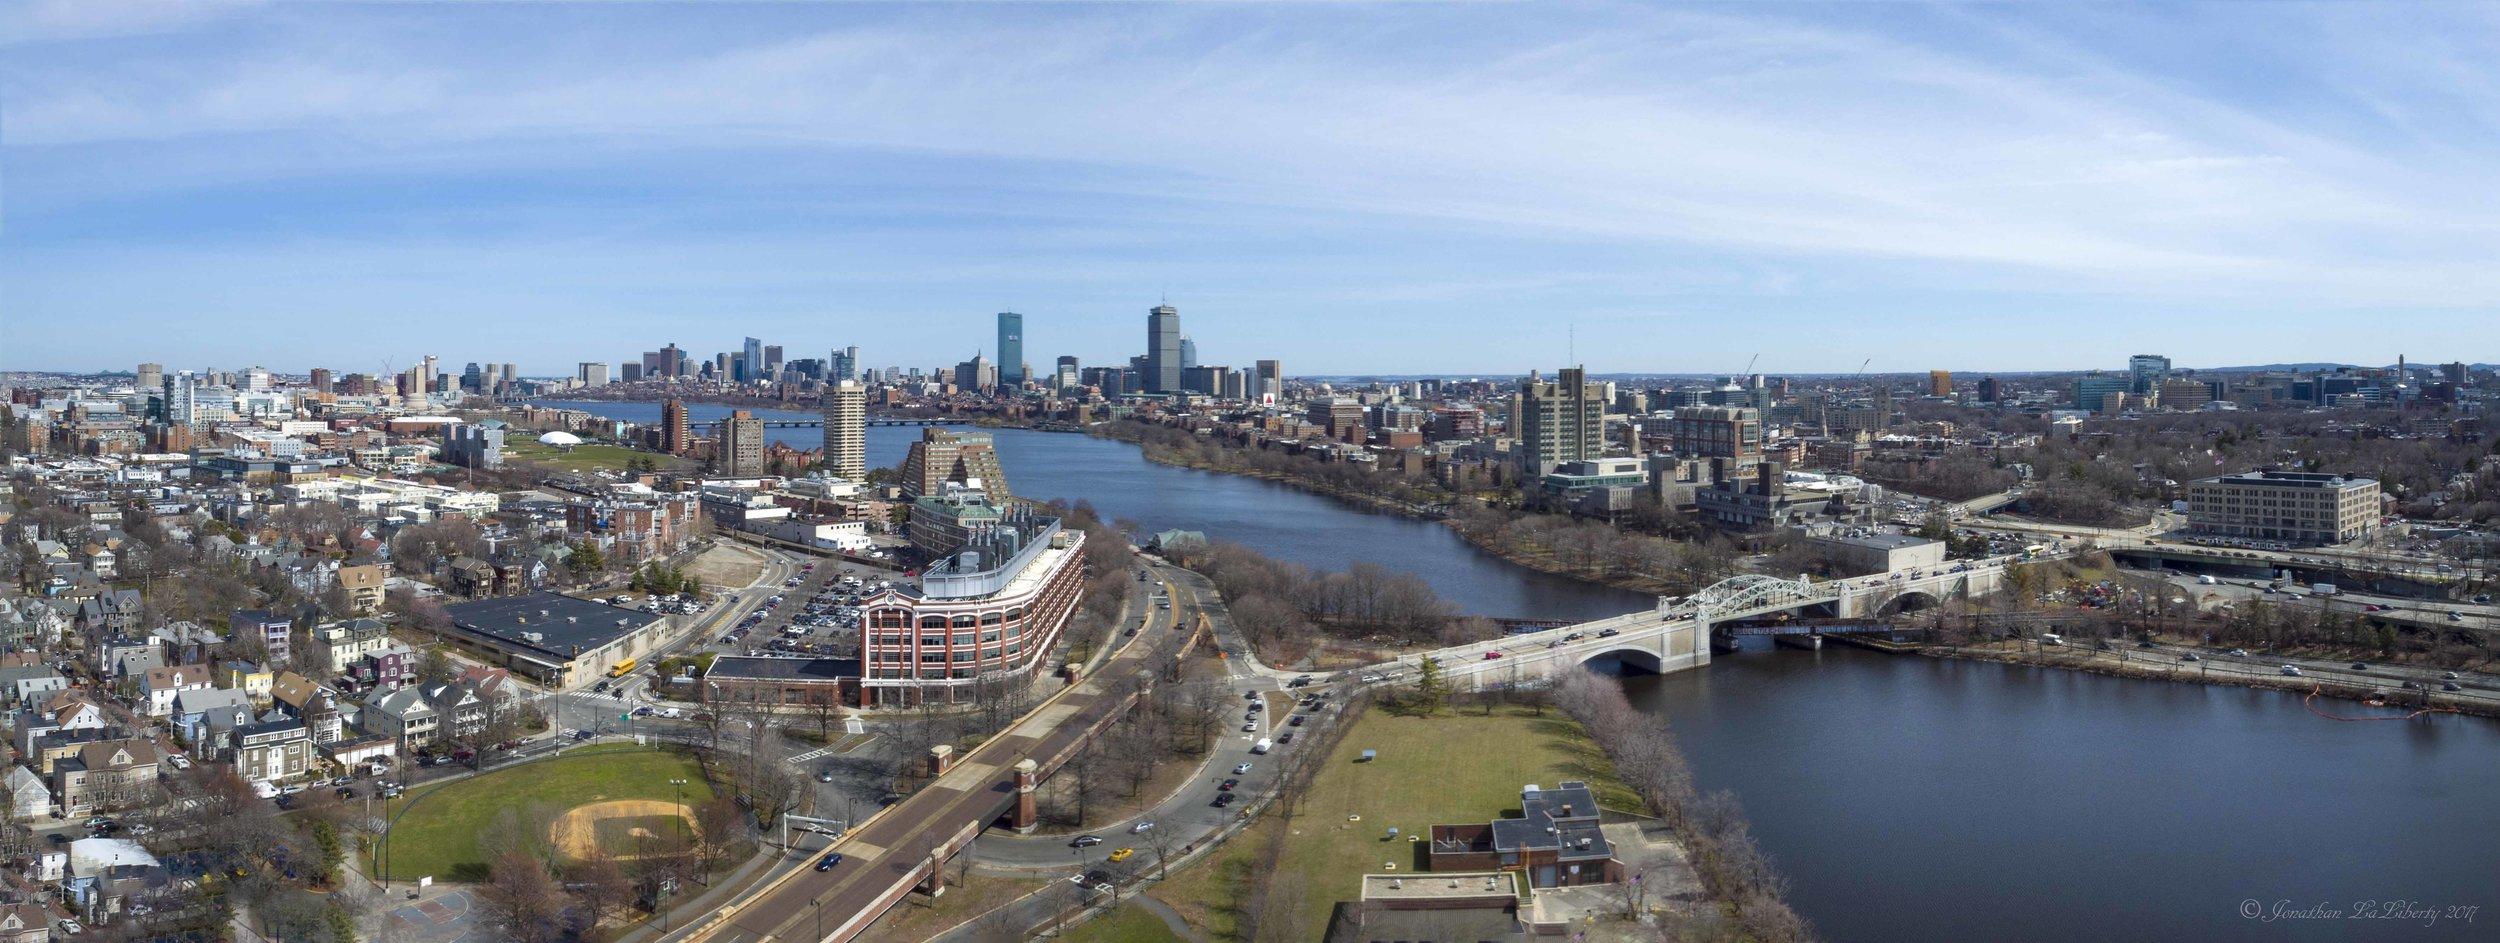 Boston Panorama Drone Photography Architecture